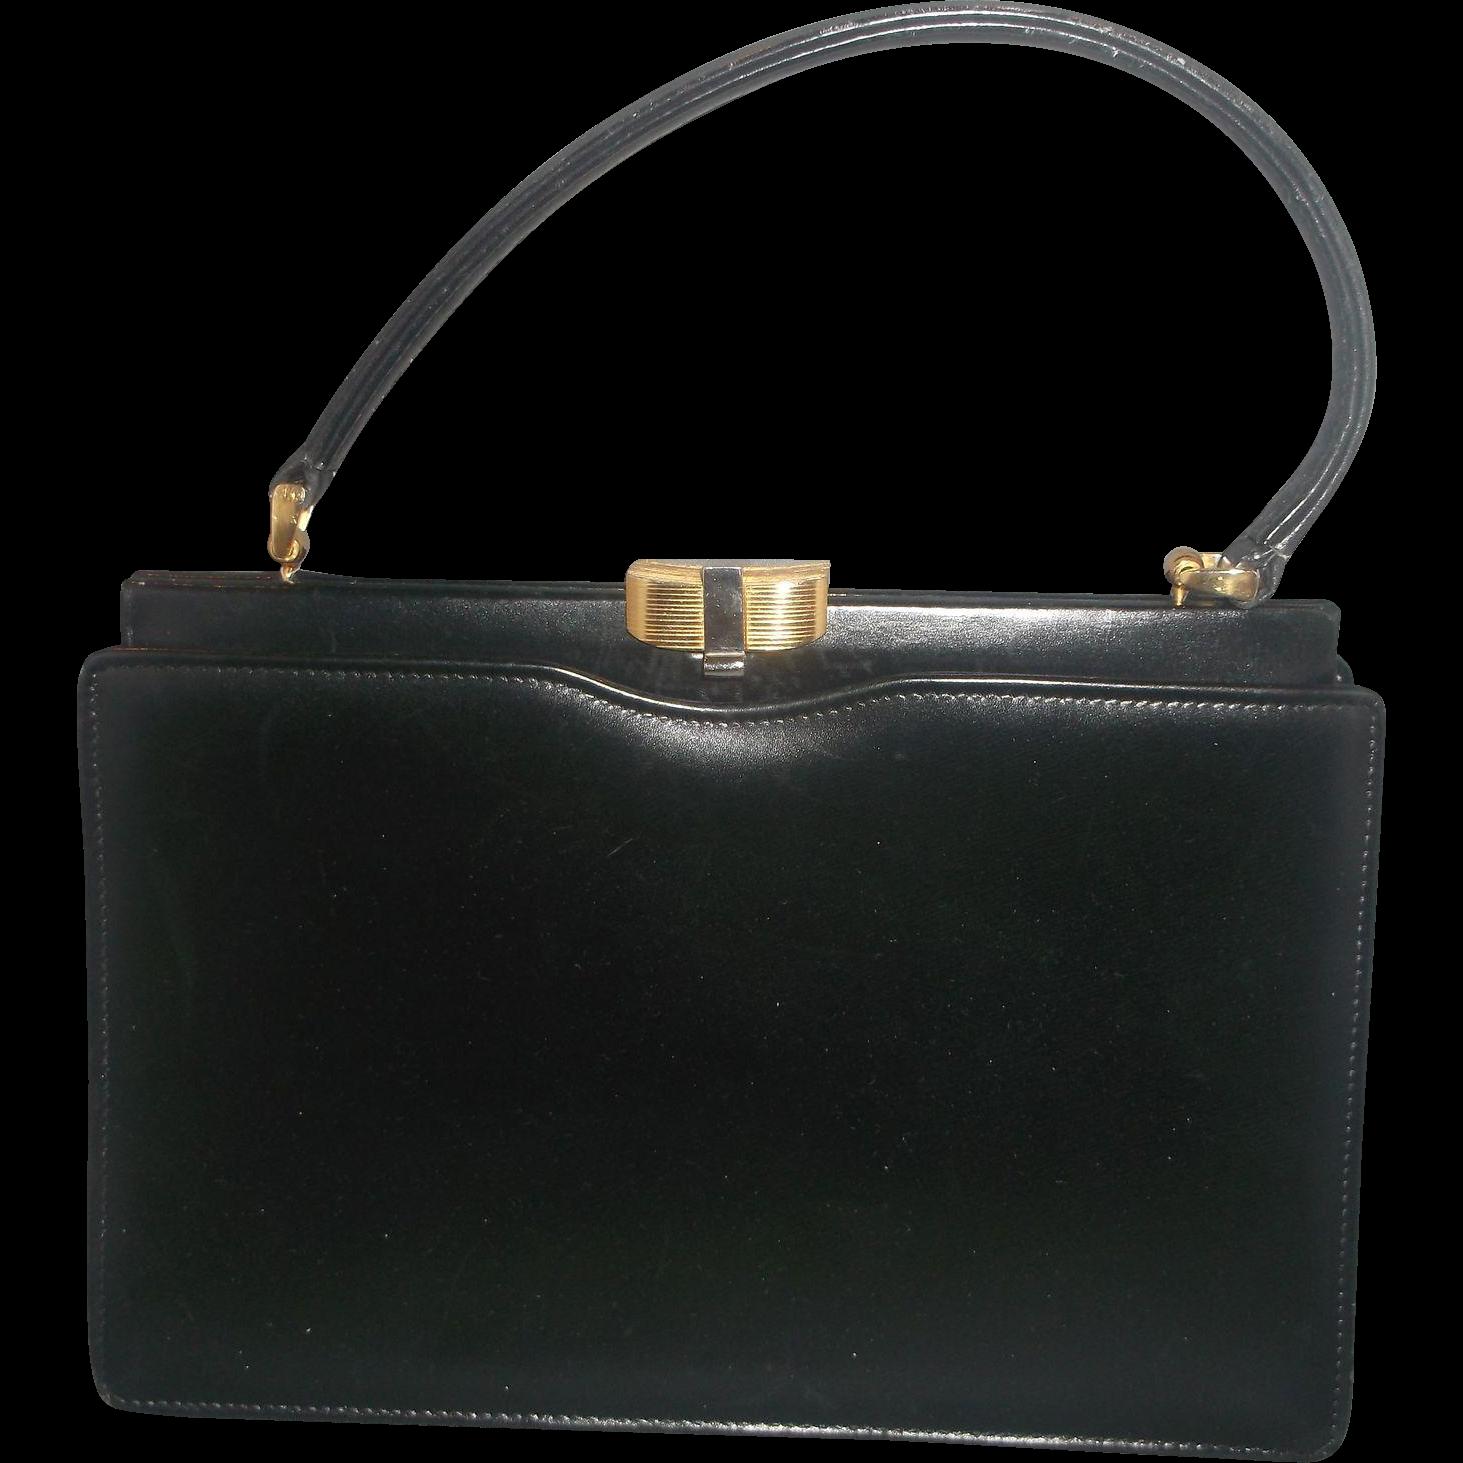 Wm H Block Black Leather Handbag Red Leather Lining Italian 1950s-60s